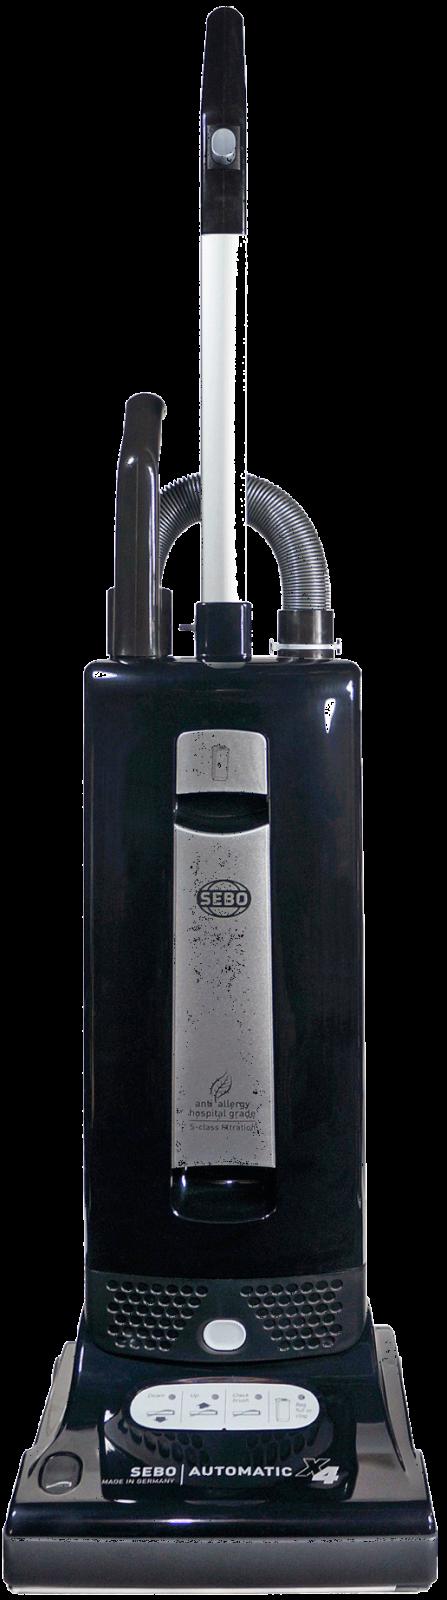 Sebo AutoX 4 Premium Onyx Collection (Black) 9501AM